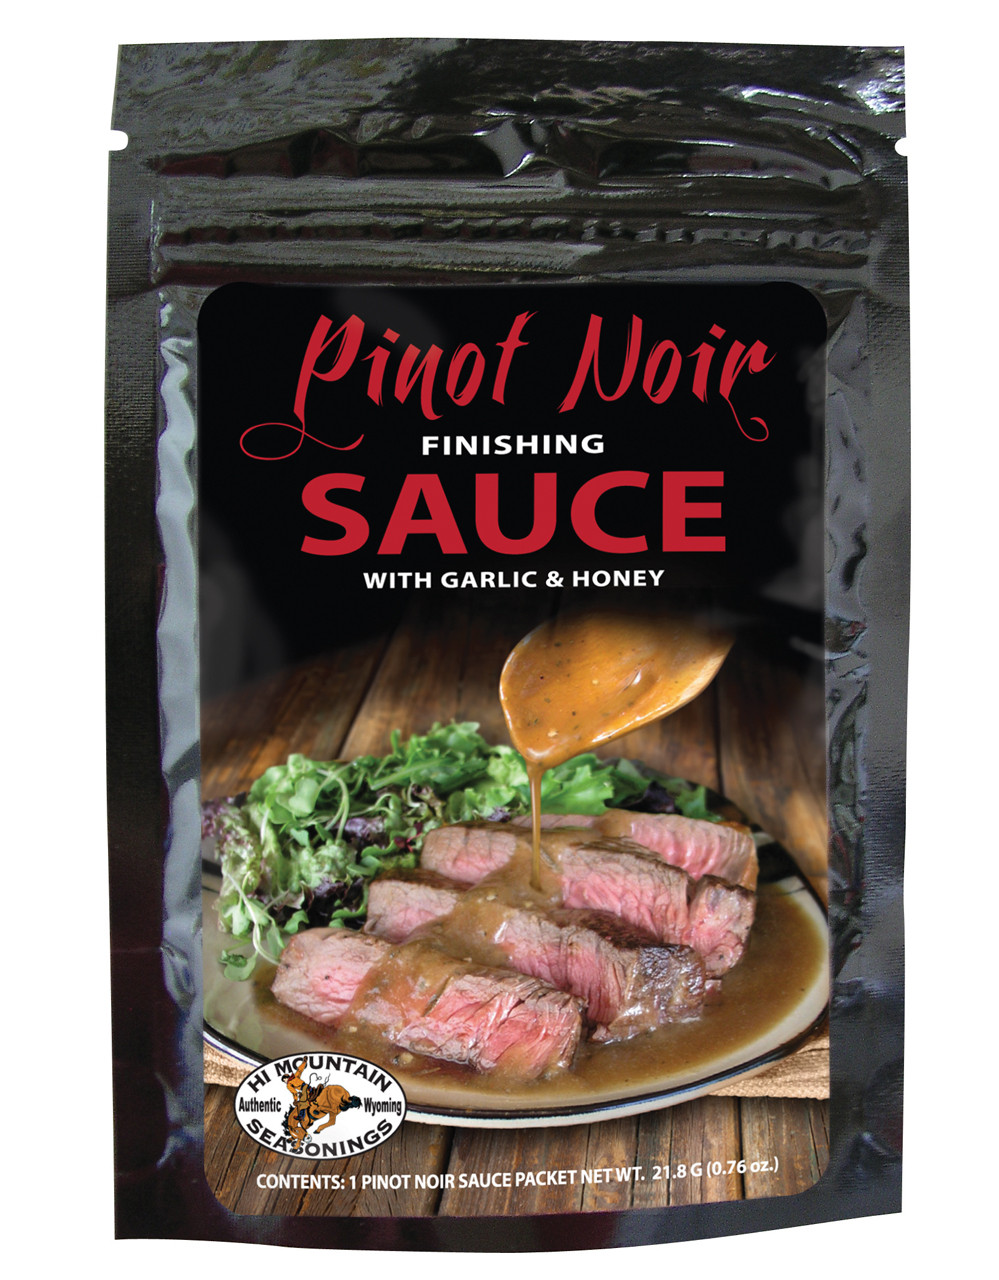 Pinot Noir Finishing Sauce